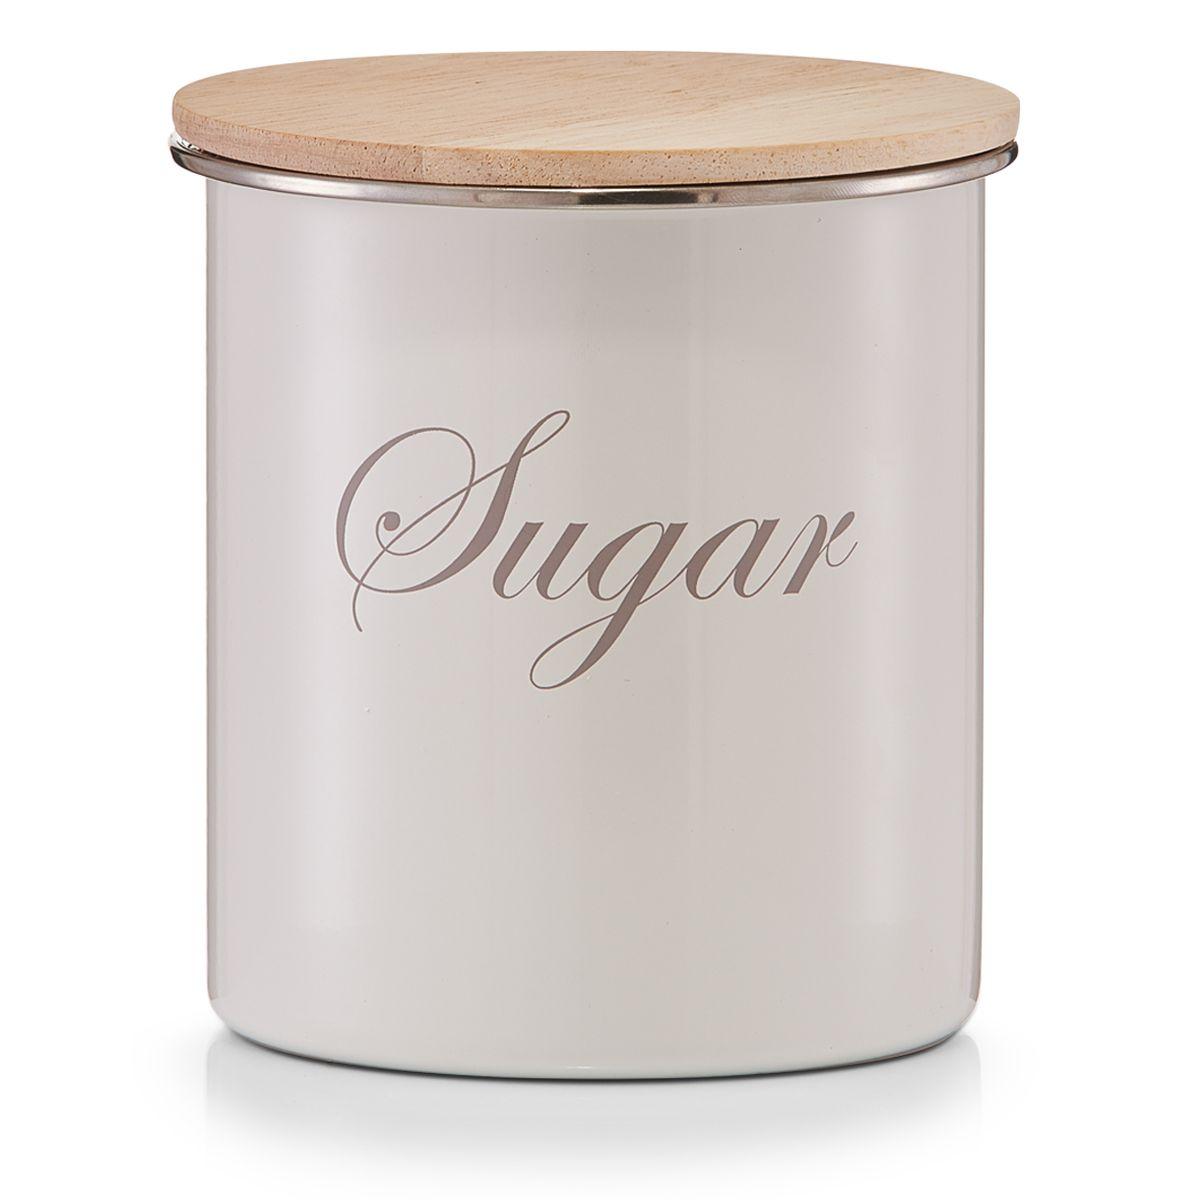 Банка для хранения Zeller Sugar, 11,2 х 11,2 х 12,5 см19311